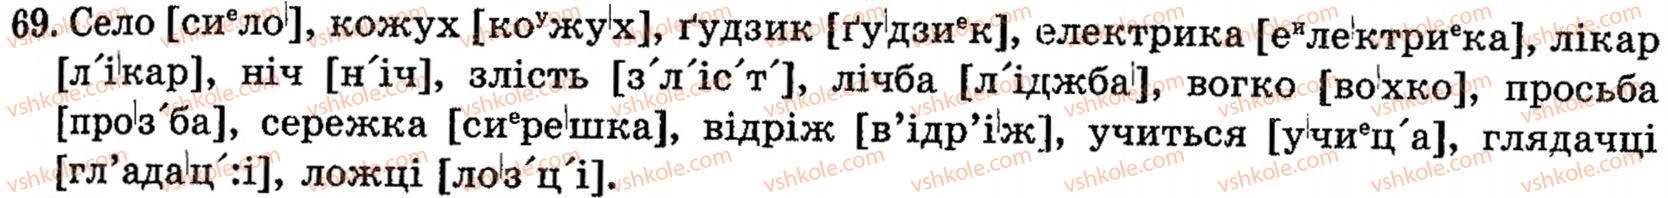 10-ukrayinska-mova-ov-zabolotnij-vv-zabolotnij-69